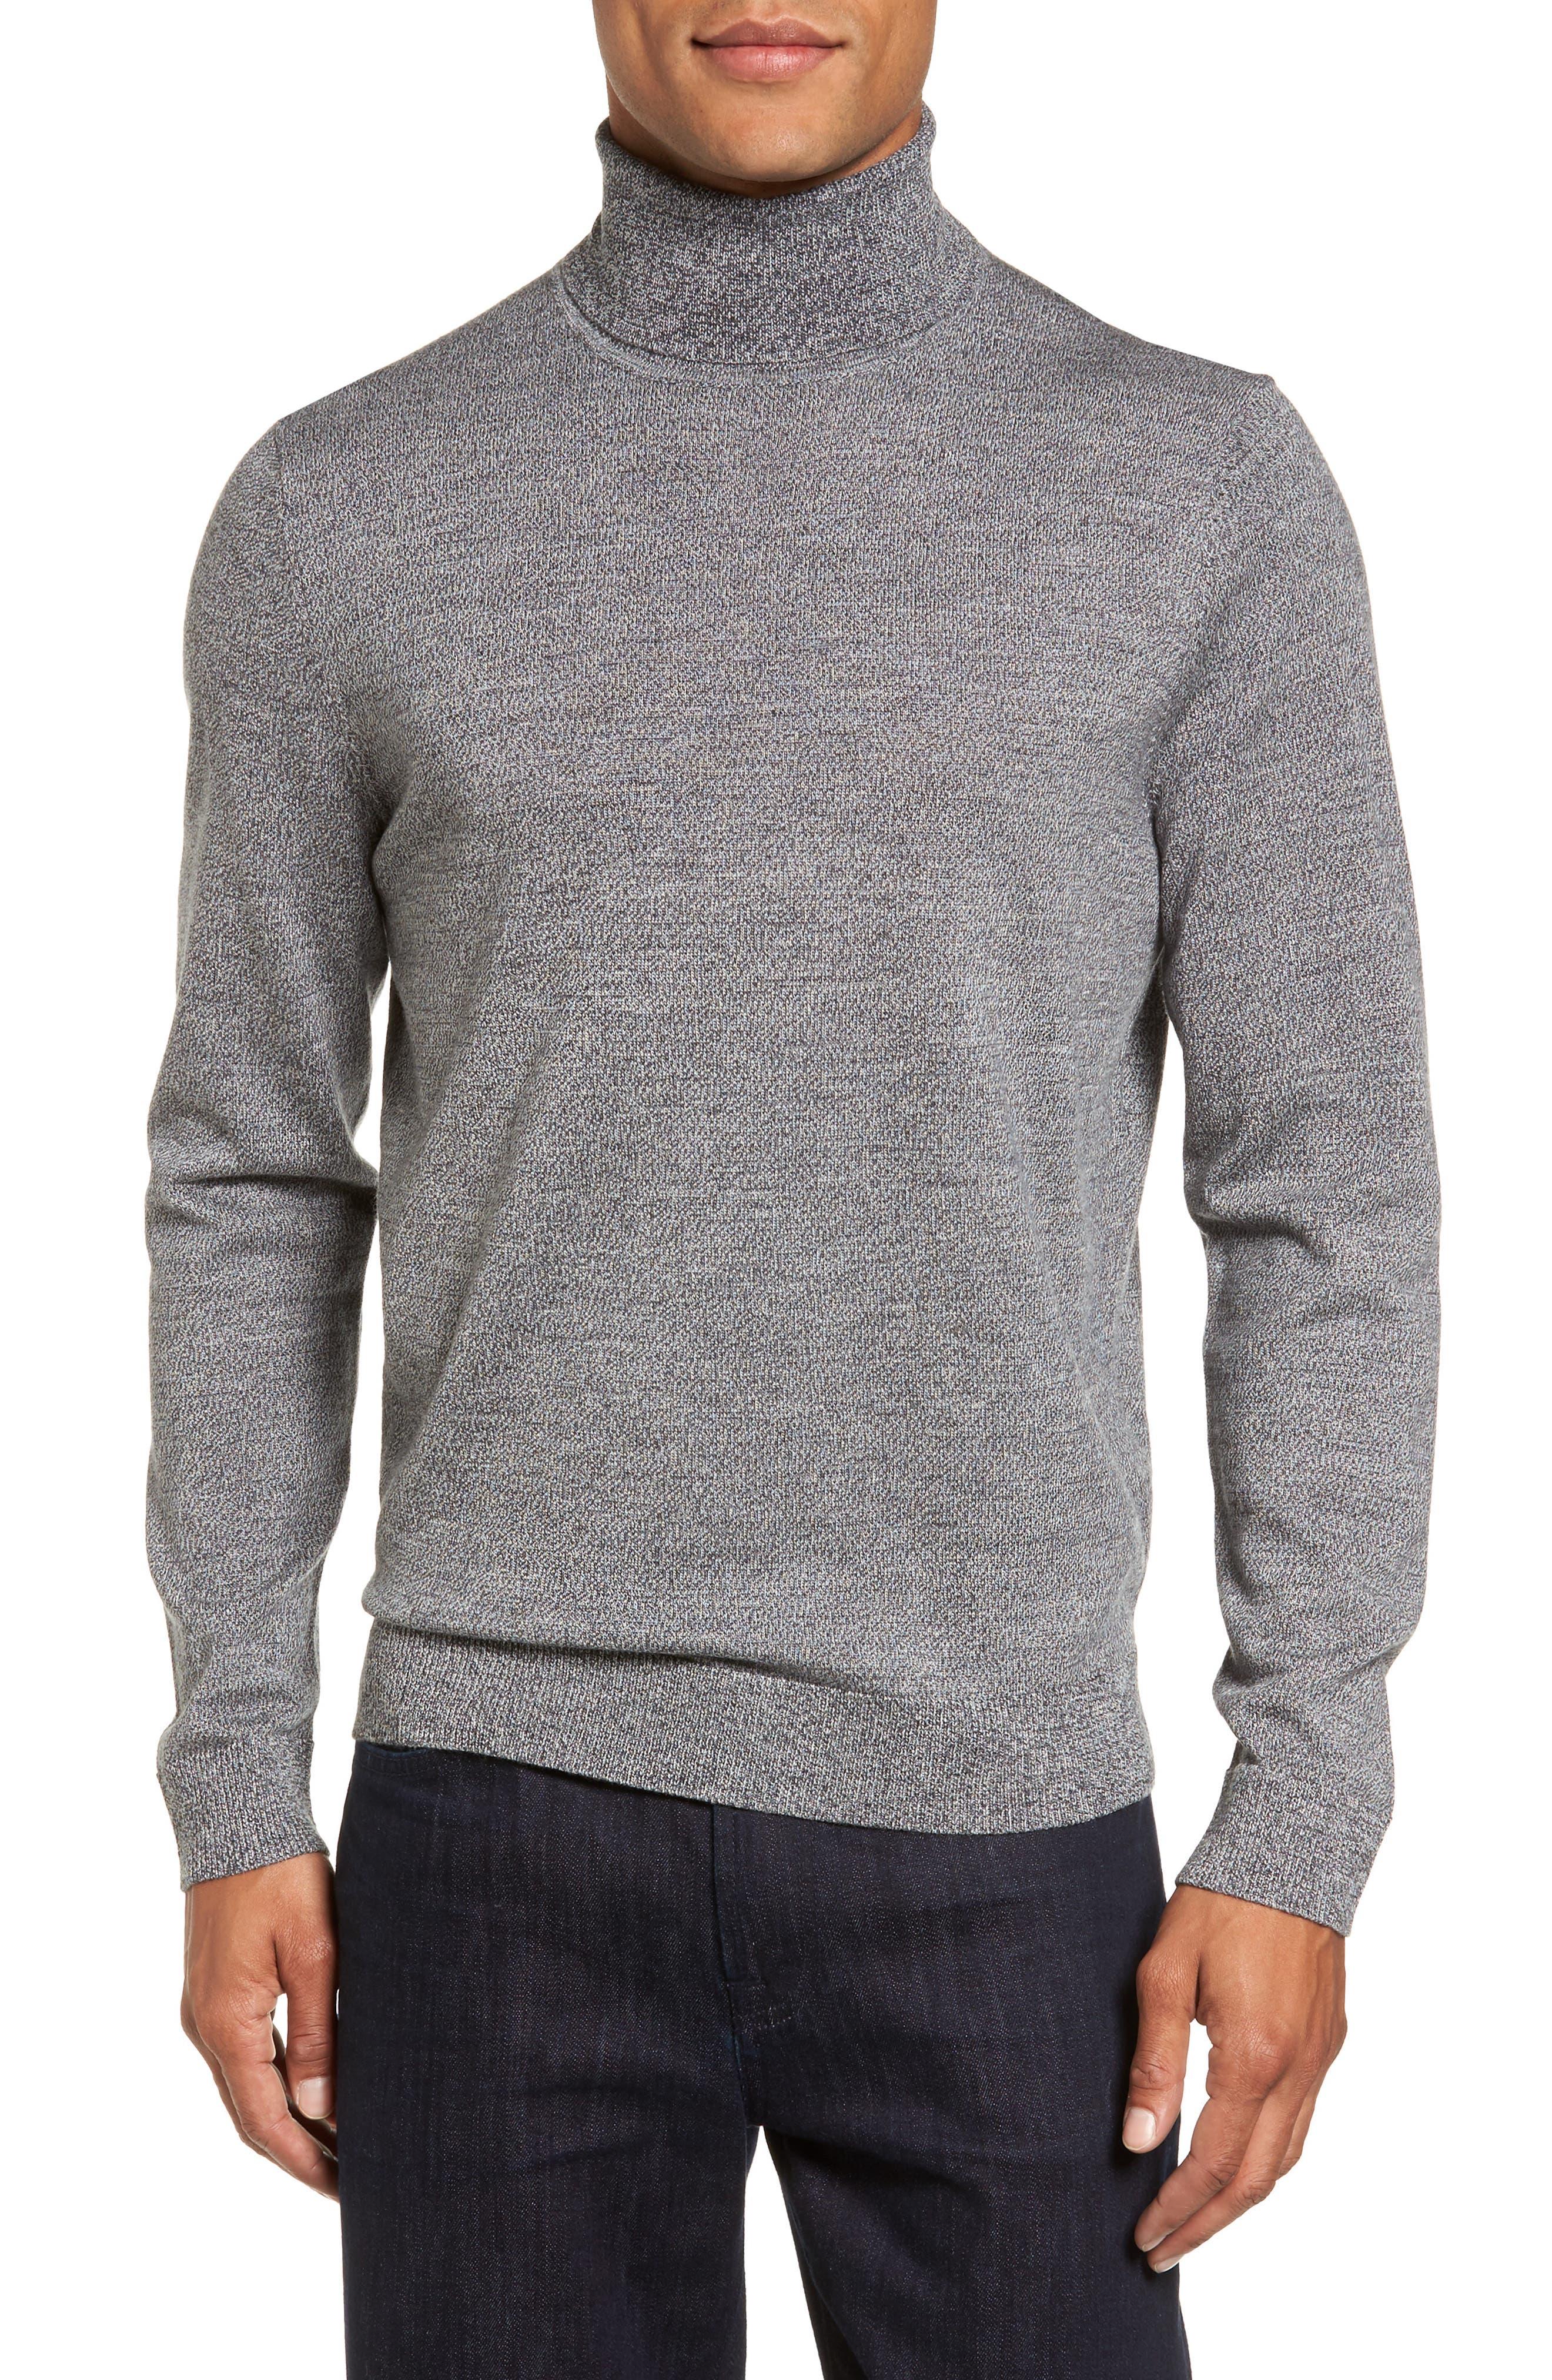 Main Image - Nordstrom Men's Shop Merino Wool Turtleneck Sweater